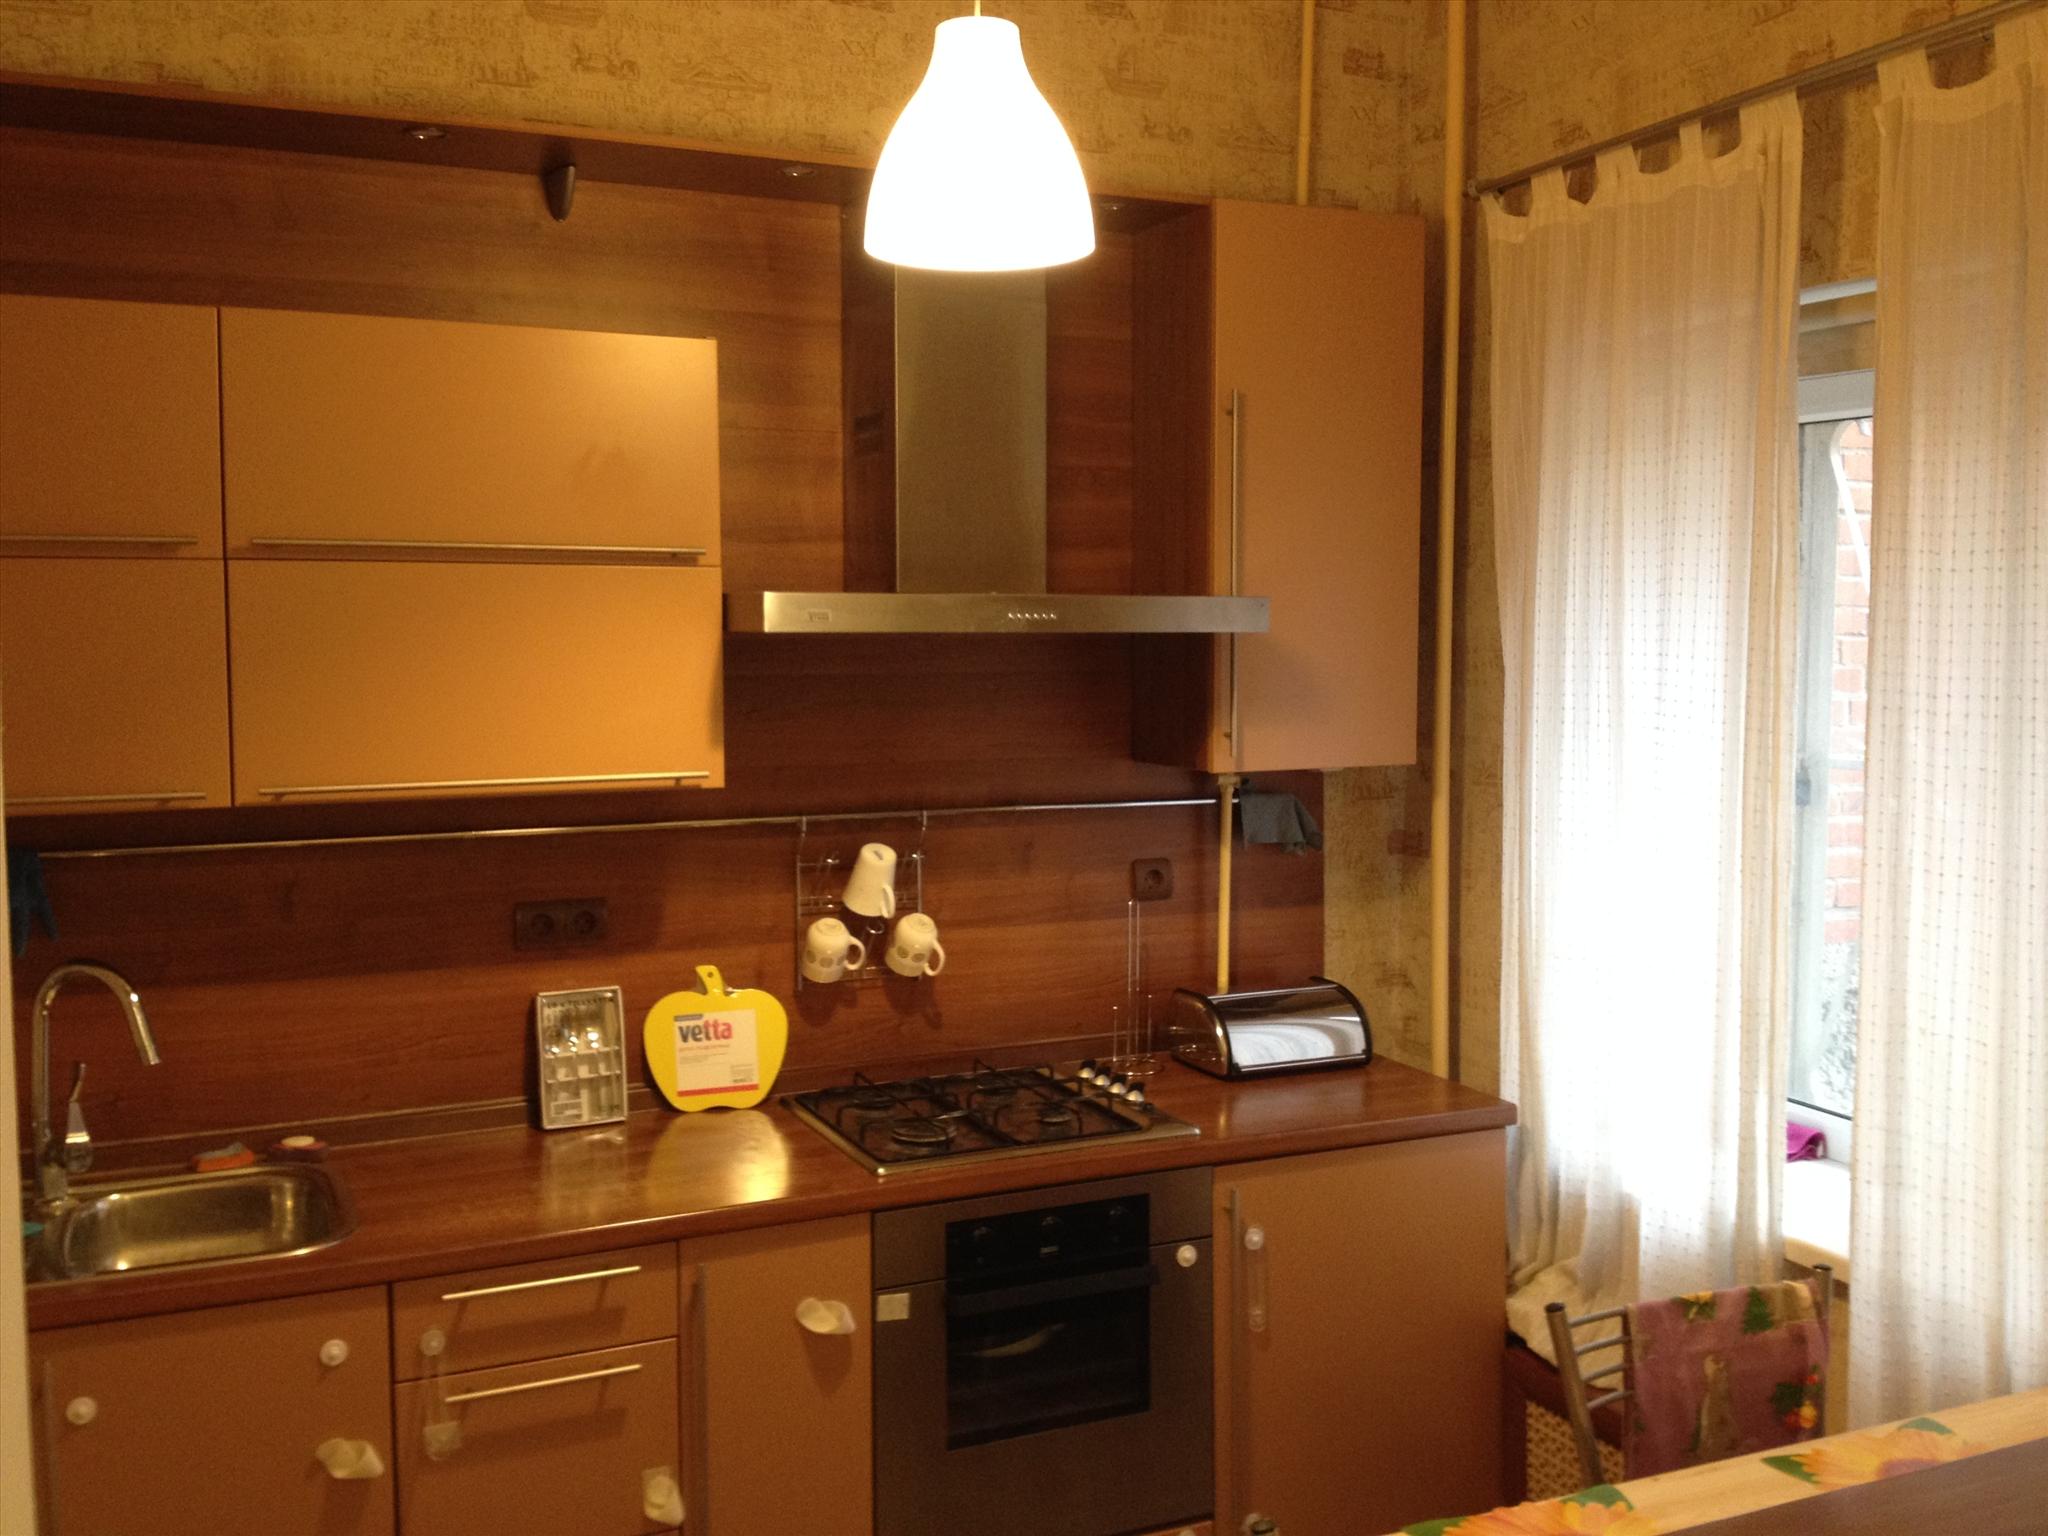 13 объявлений - купить 2-комнатную квартиру без посредников .